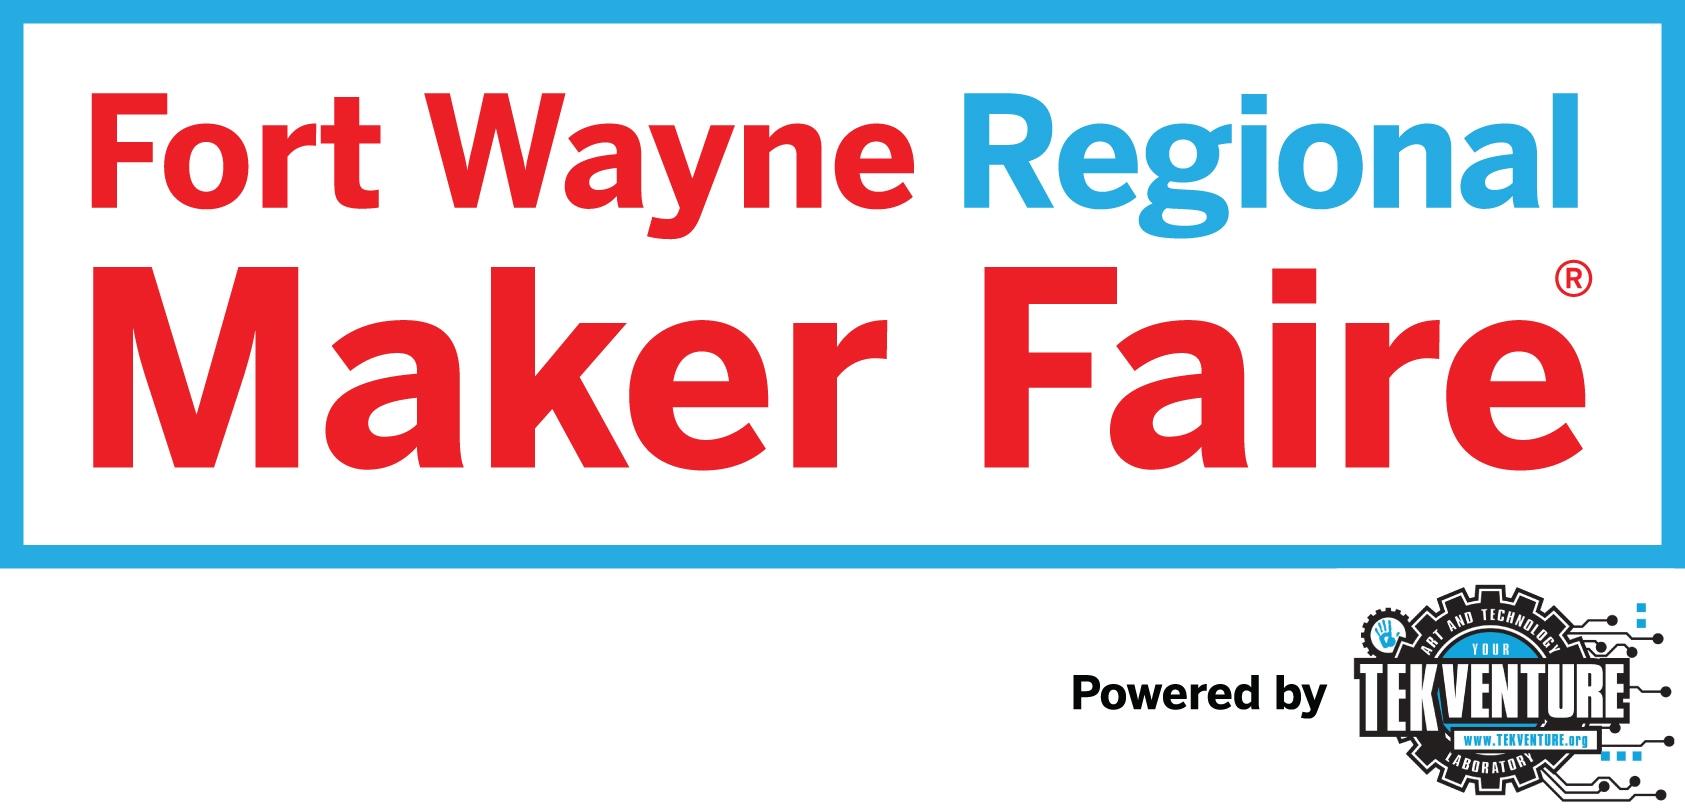 fort wayne regional maker faire logo horizontal poster banners